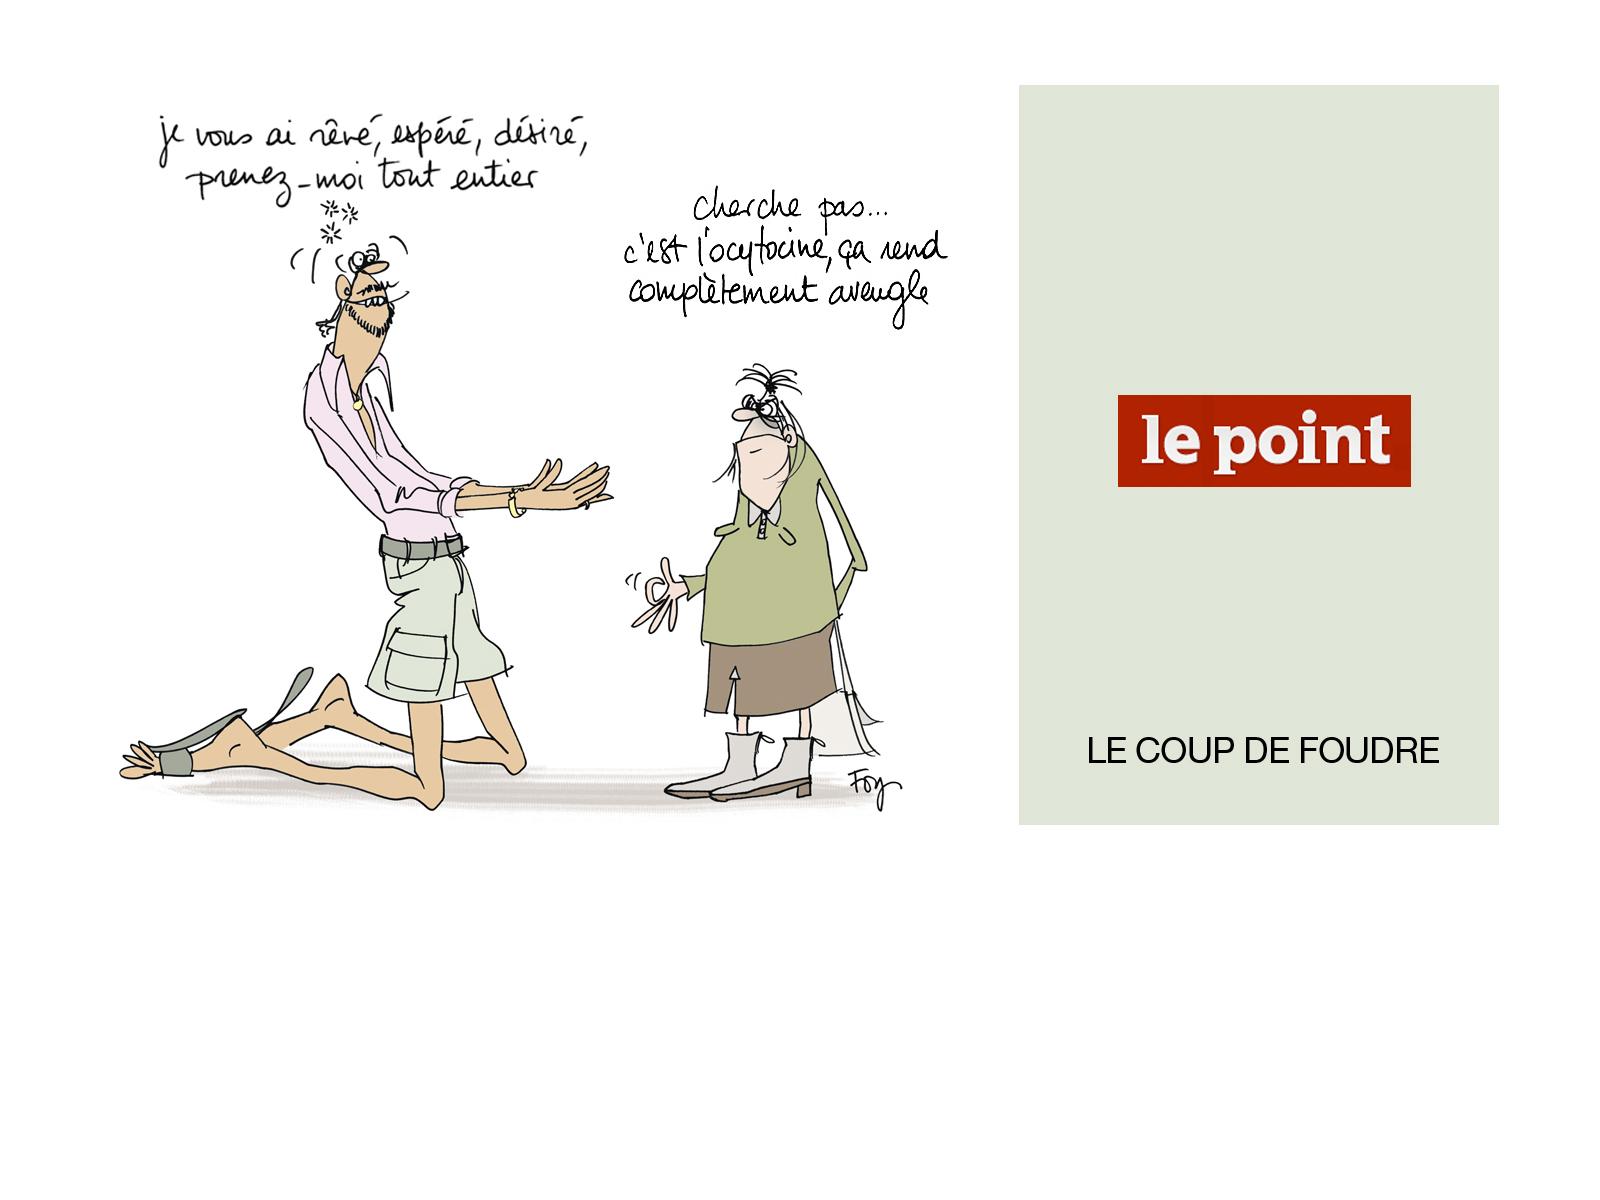 FOYDominique-Illustrations-2612